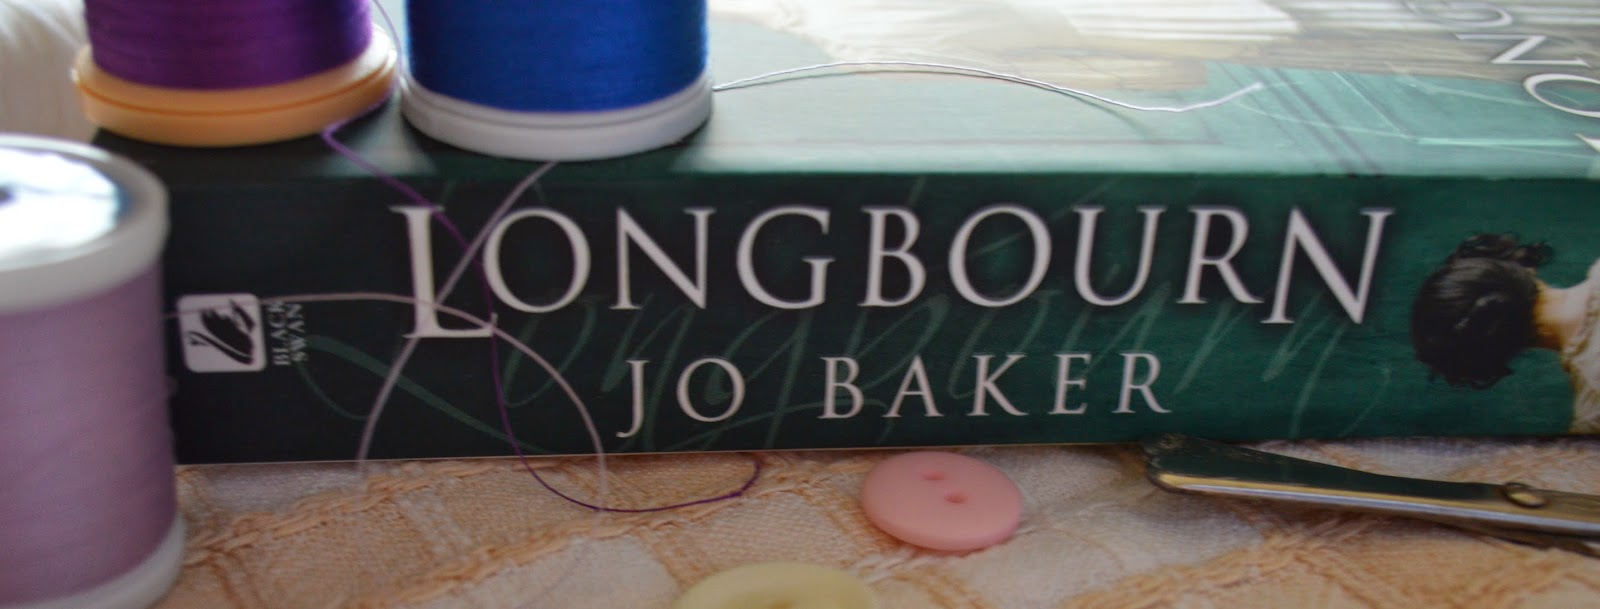 Pride and Prejudice, Longbourn, Jo Baker, review, book, literature, novel, retelling, servants perspective, Sarah, paperback, book cover, photo, photography